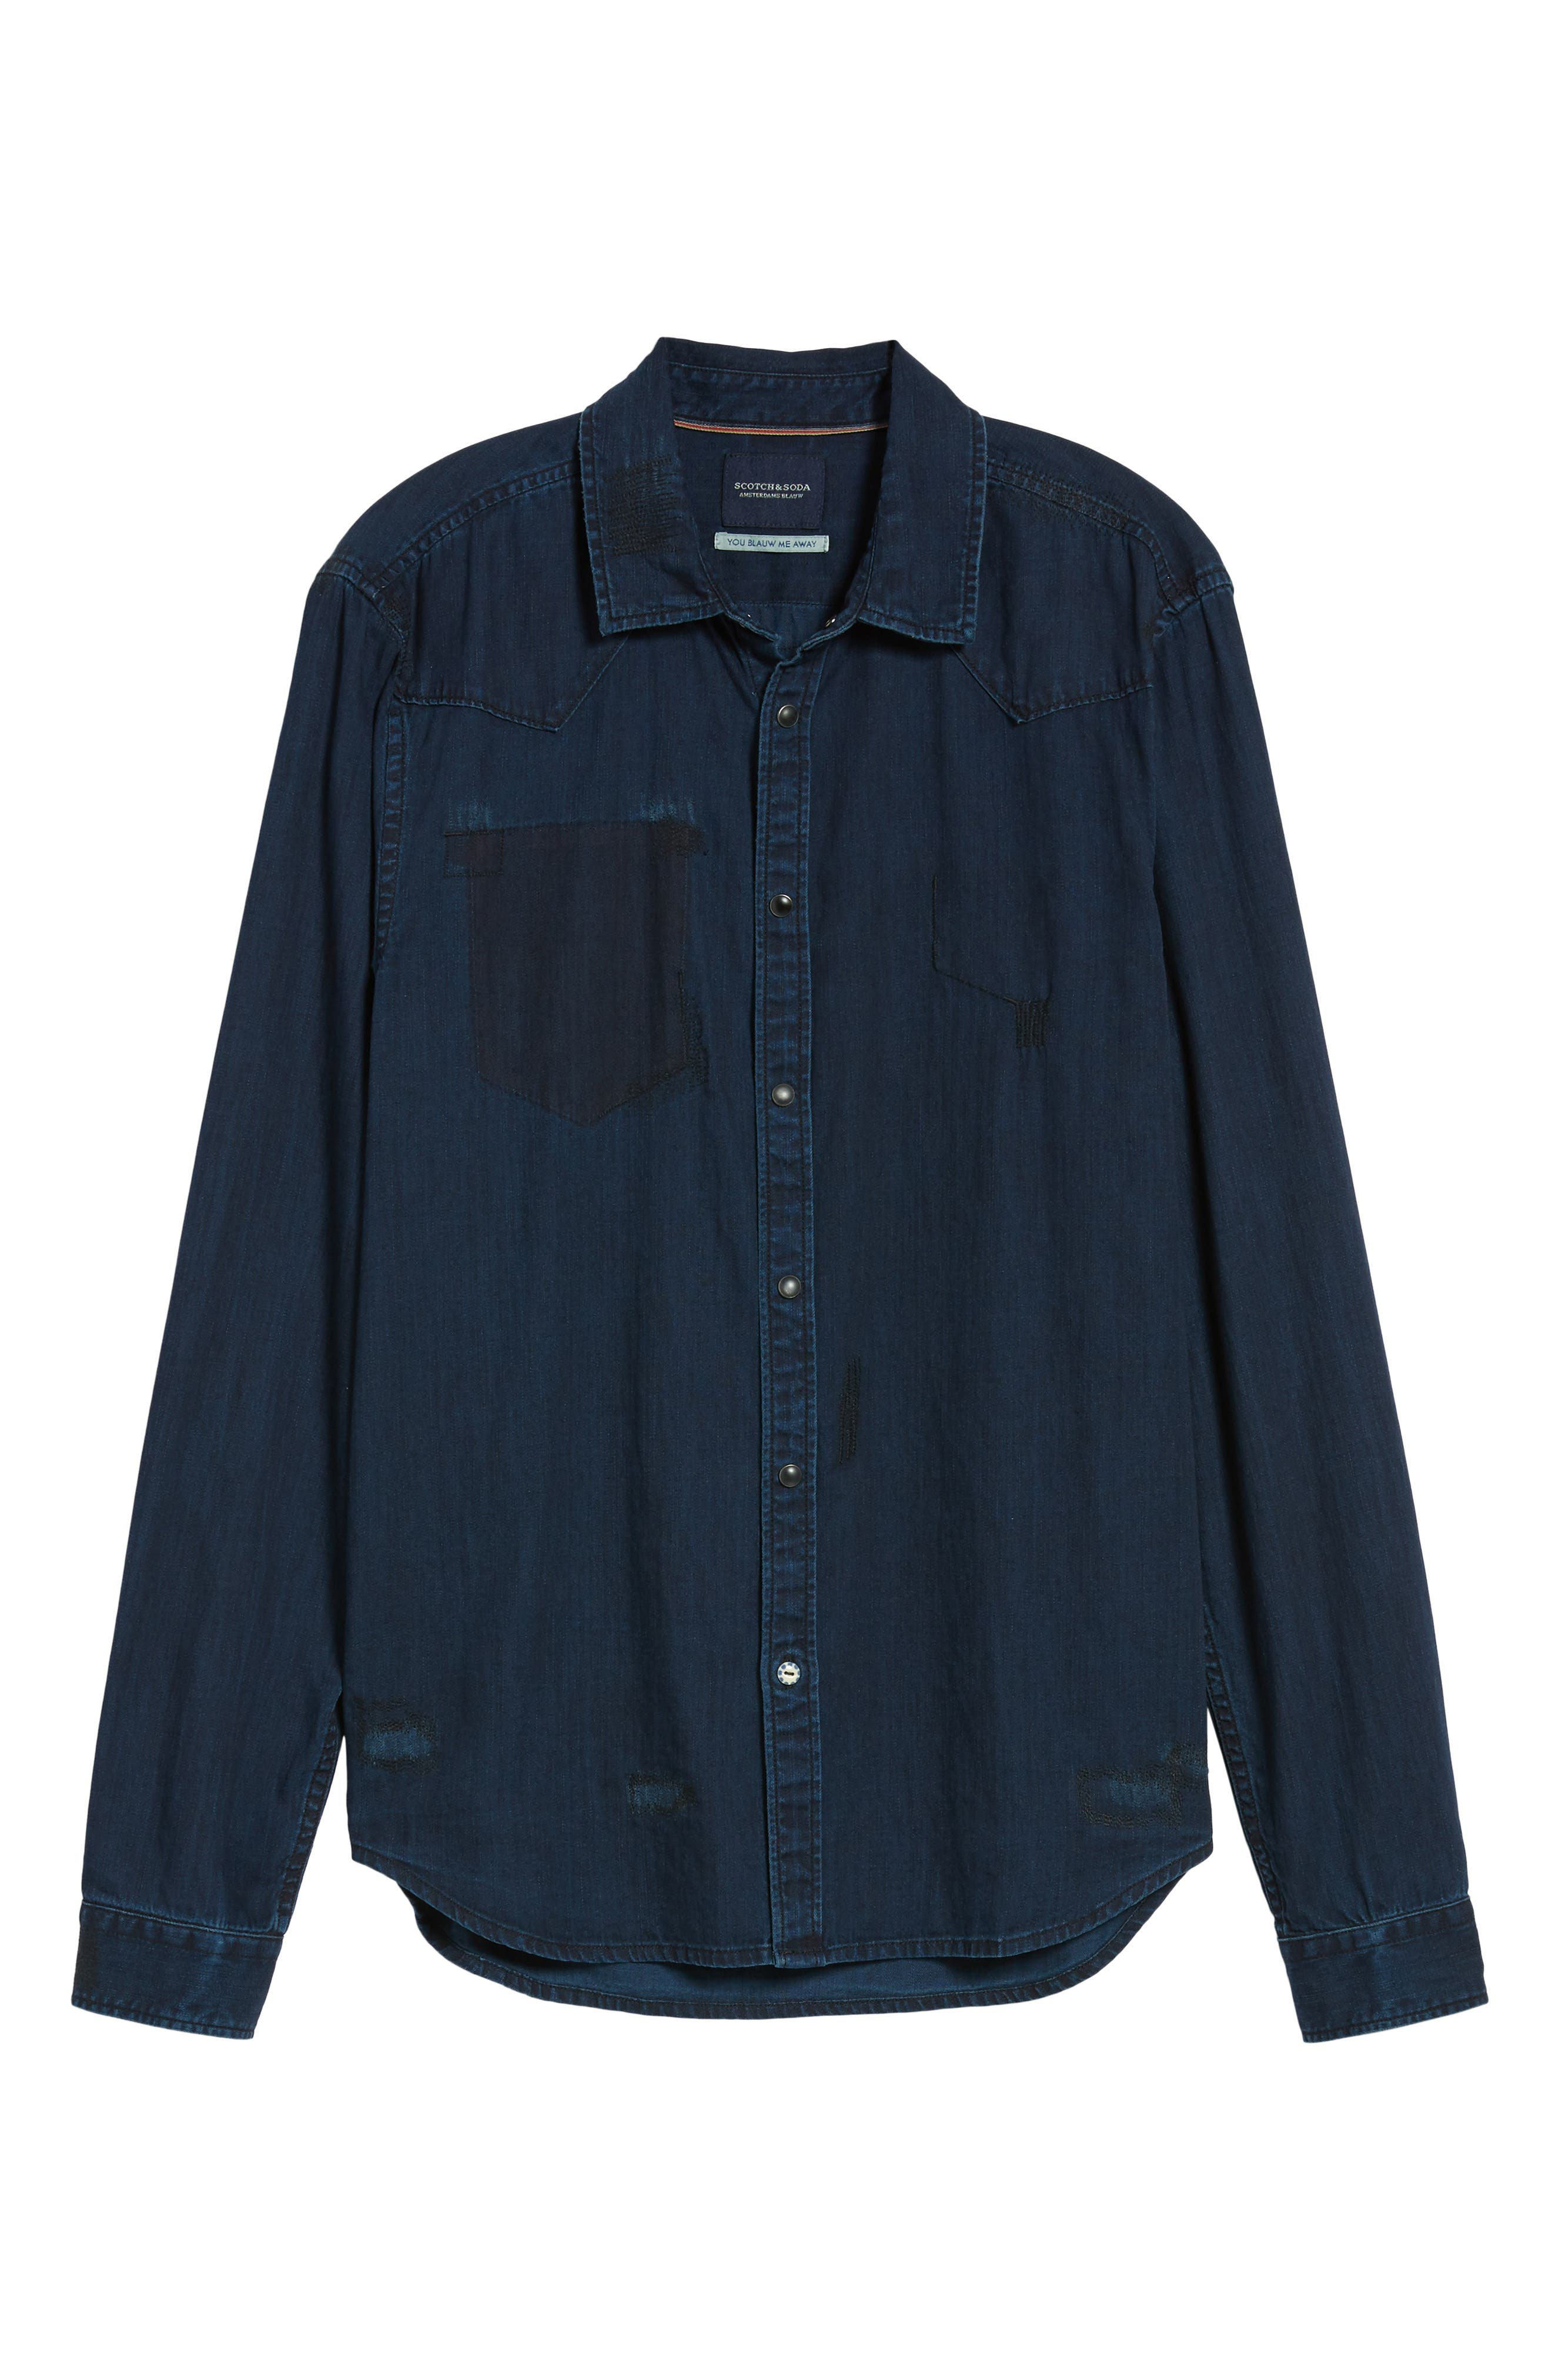 Pocketless Western Denim Shirt,                             Alternate thumbnail 6, color,